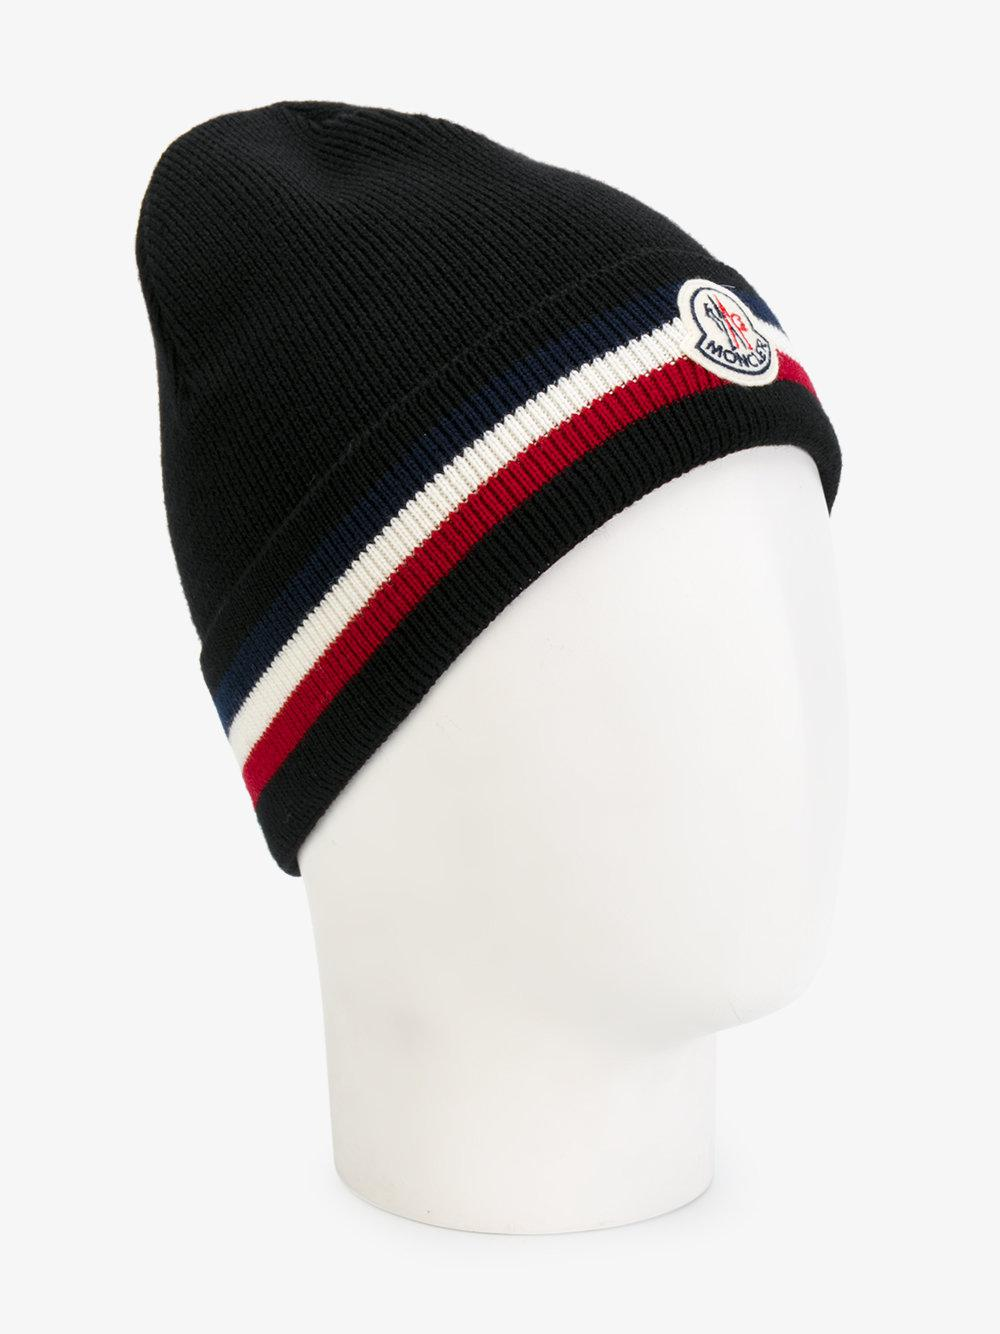 Lyst - Moncler Berretto Tricolour Stripe Beanie in Black for Men 0c6dbb5014db